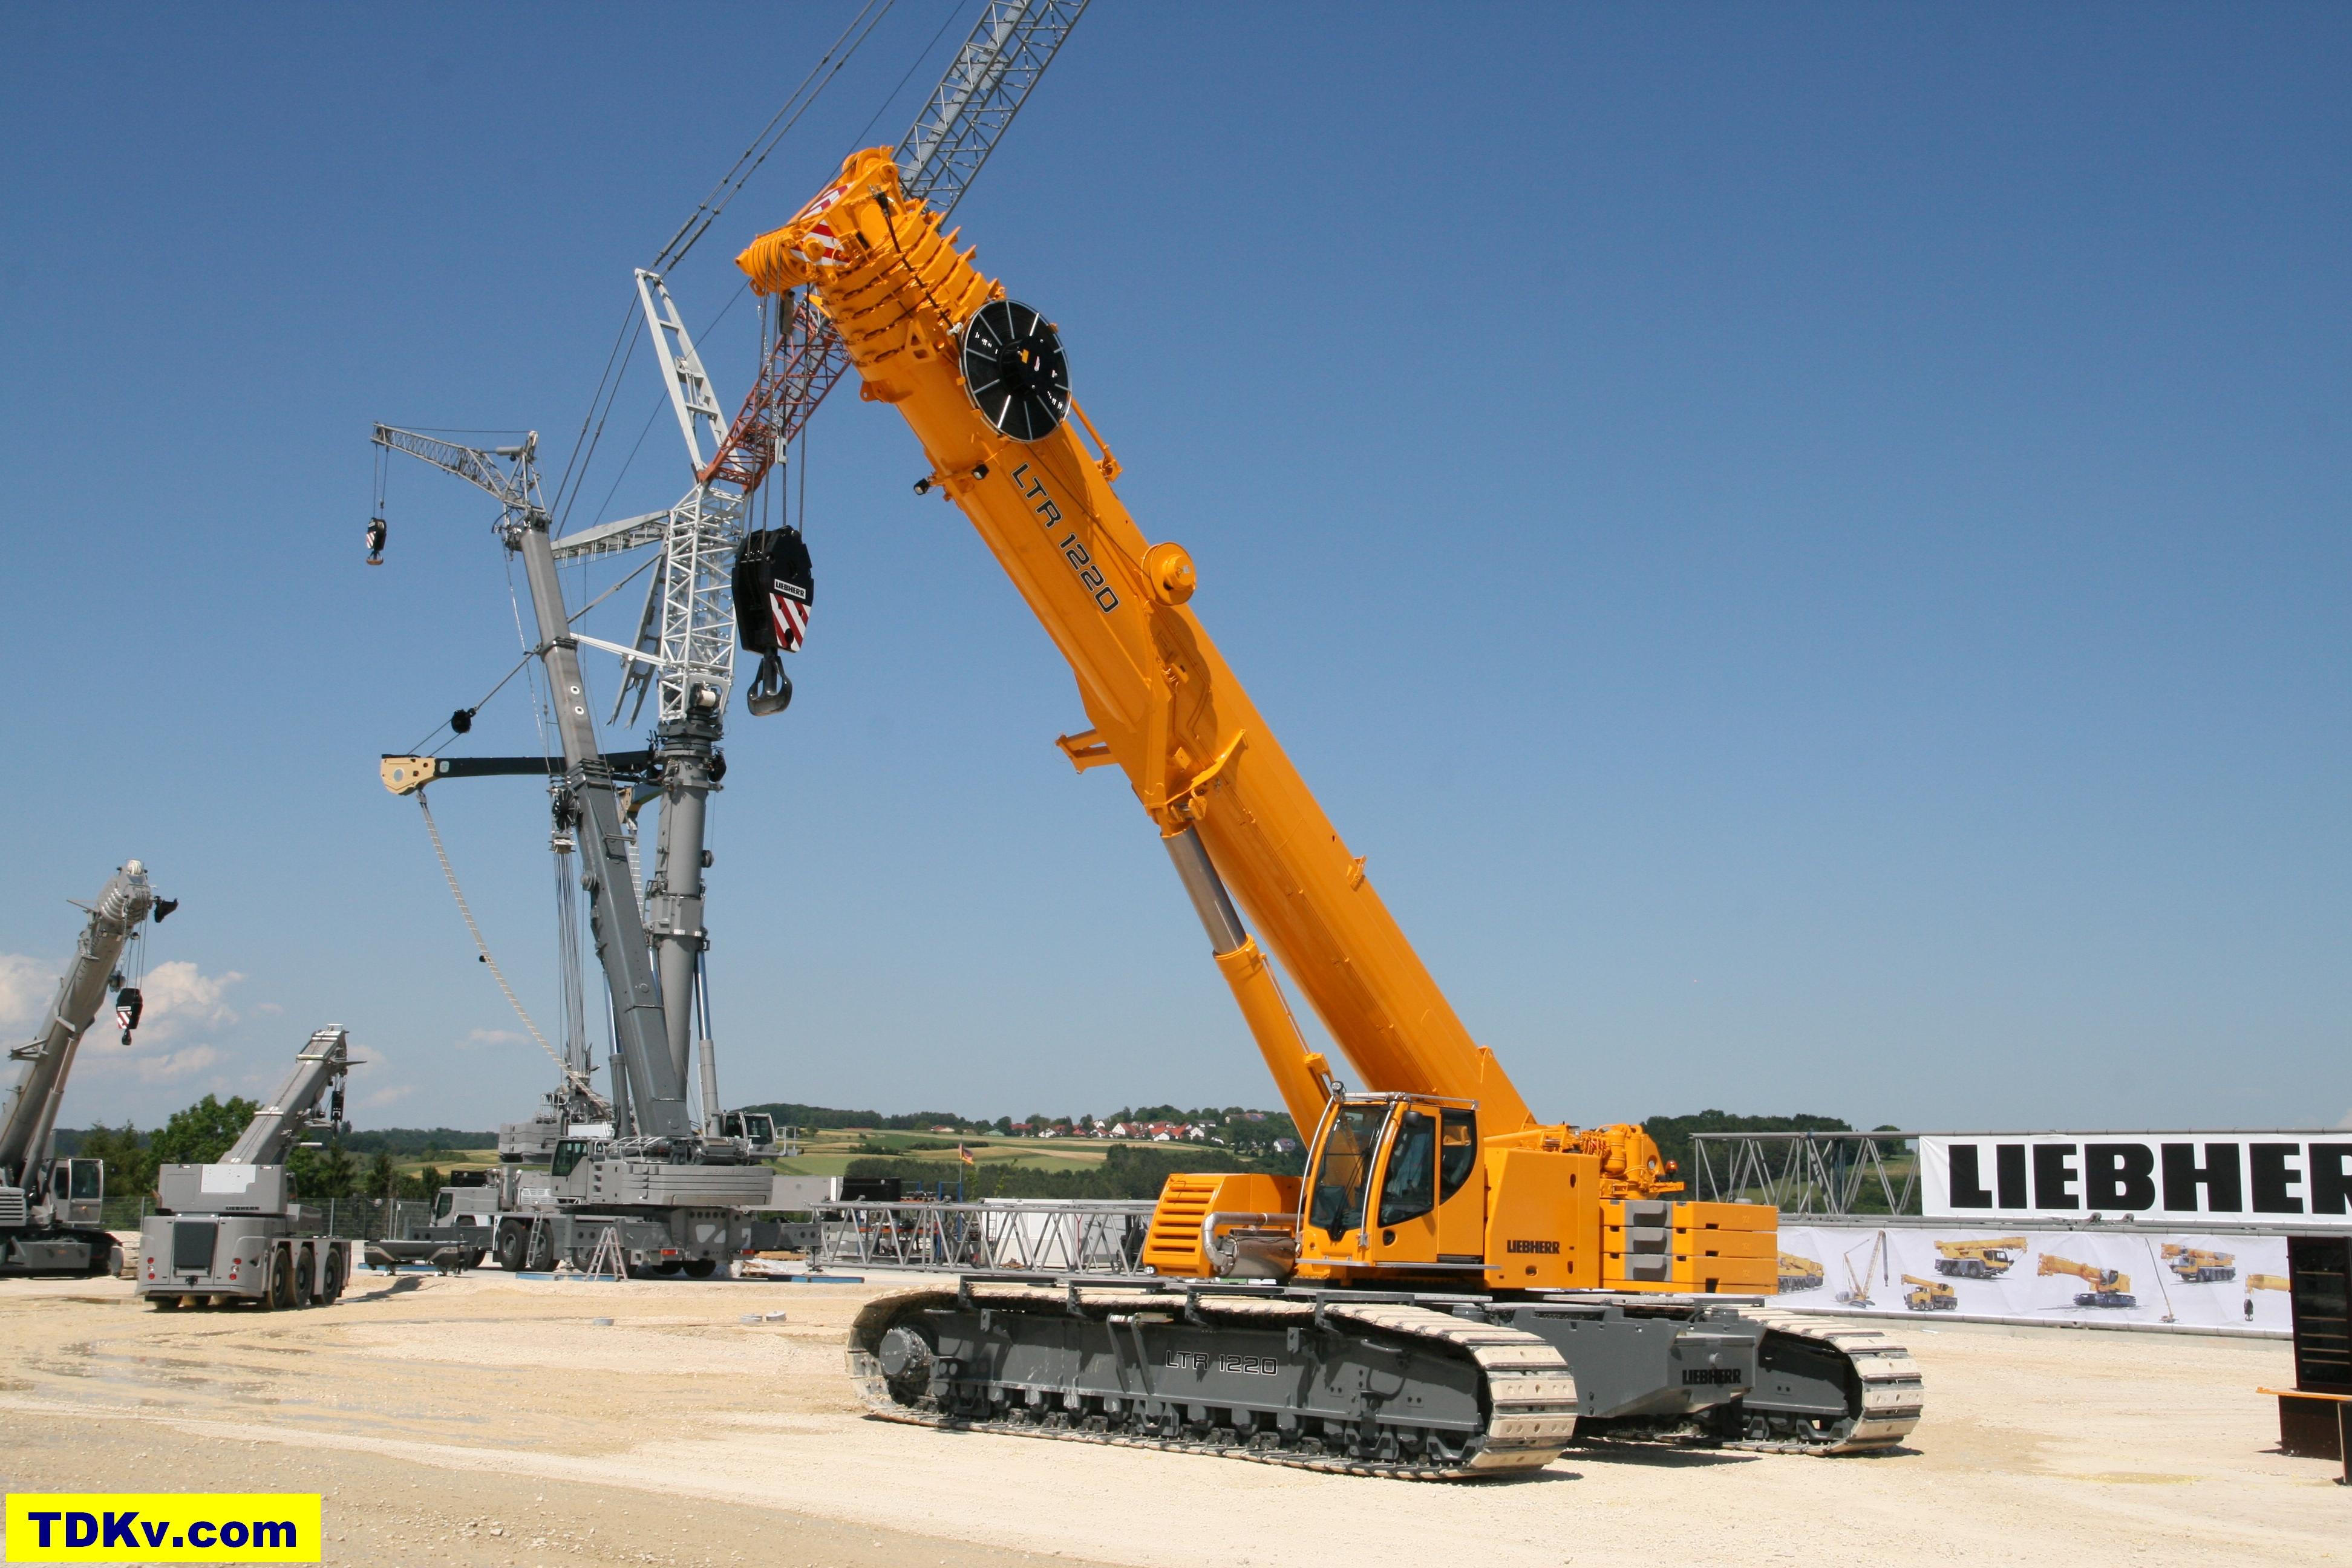 Liebherr LTR 1220 telescopic crawler crane | Equipment Handbooks